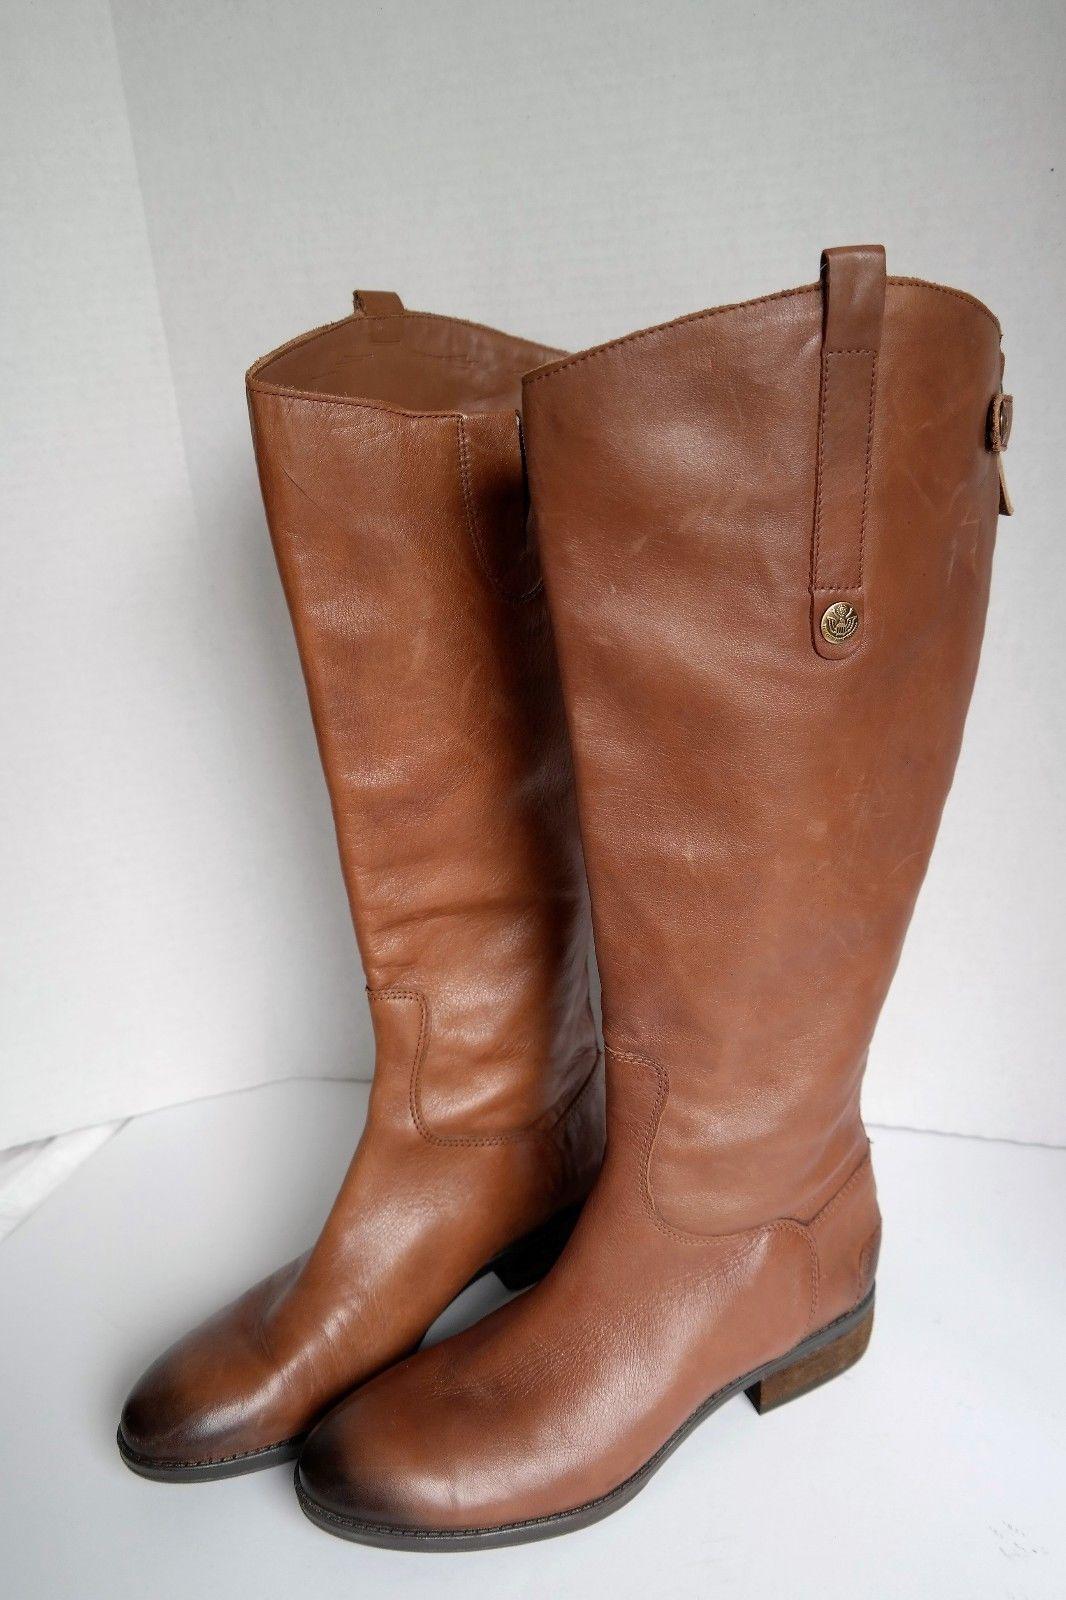 c627b2322 69.00 USD ❤ Sam Edelman Womens Riding Boots Penny 2 Size 8.5 M EU 39.5 Tall